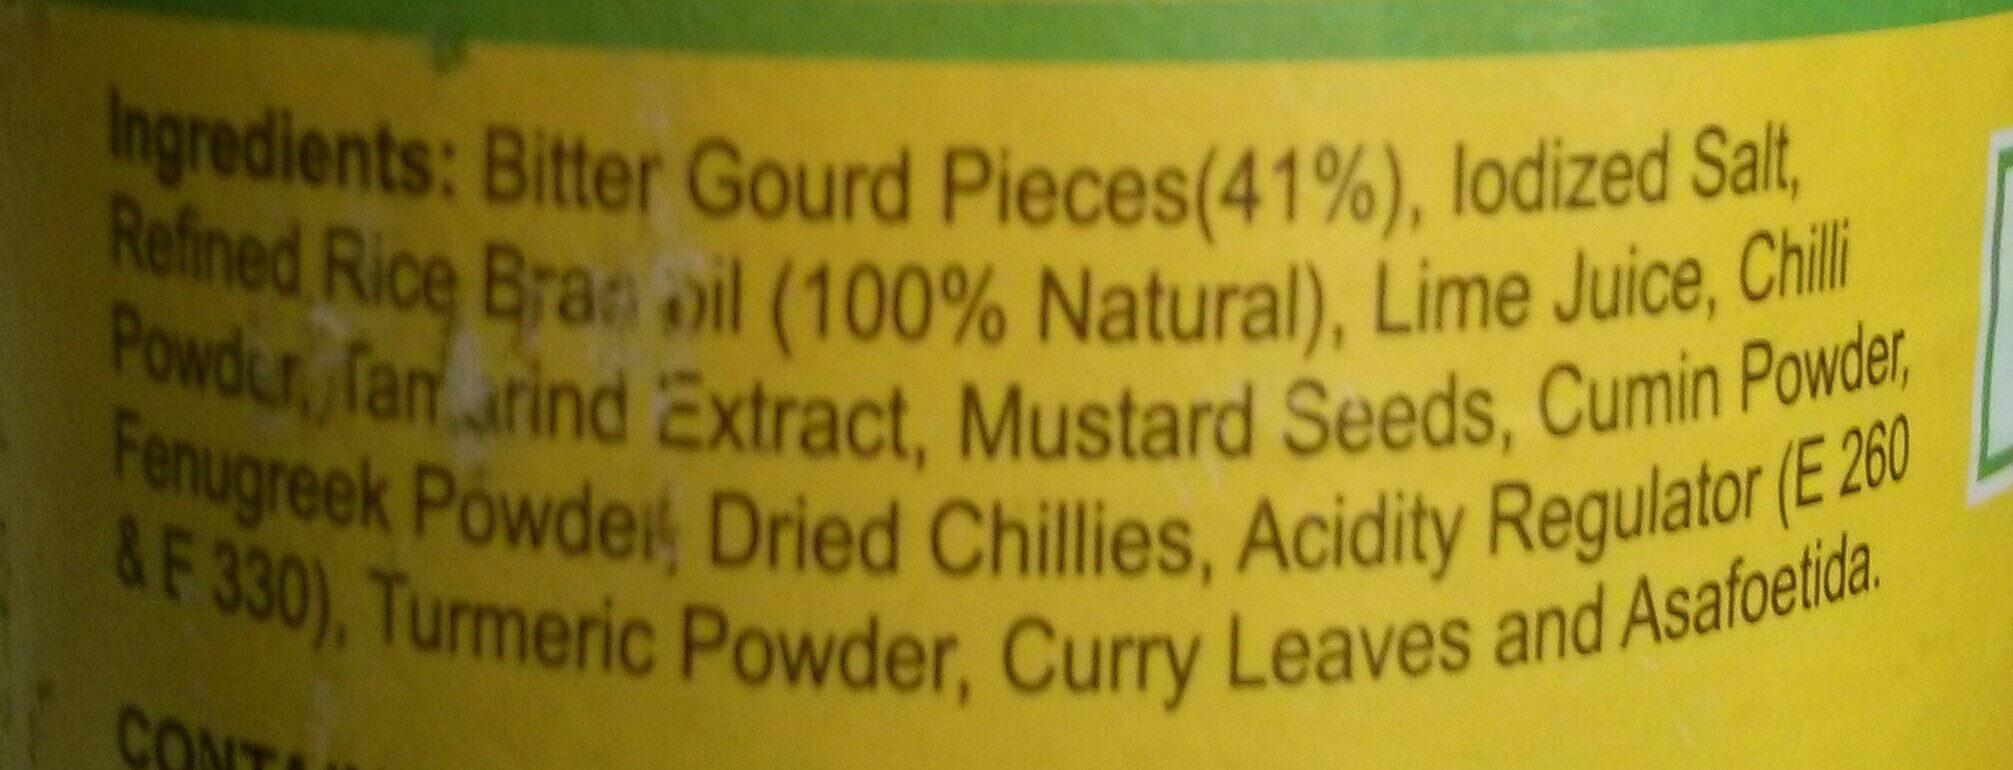 Bitter Gourd (Karela) Pickle in oil (without garlic) - Ingredients - en